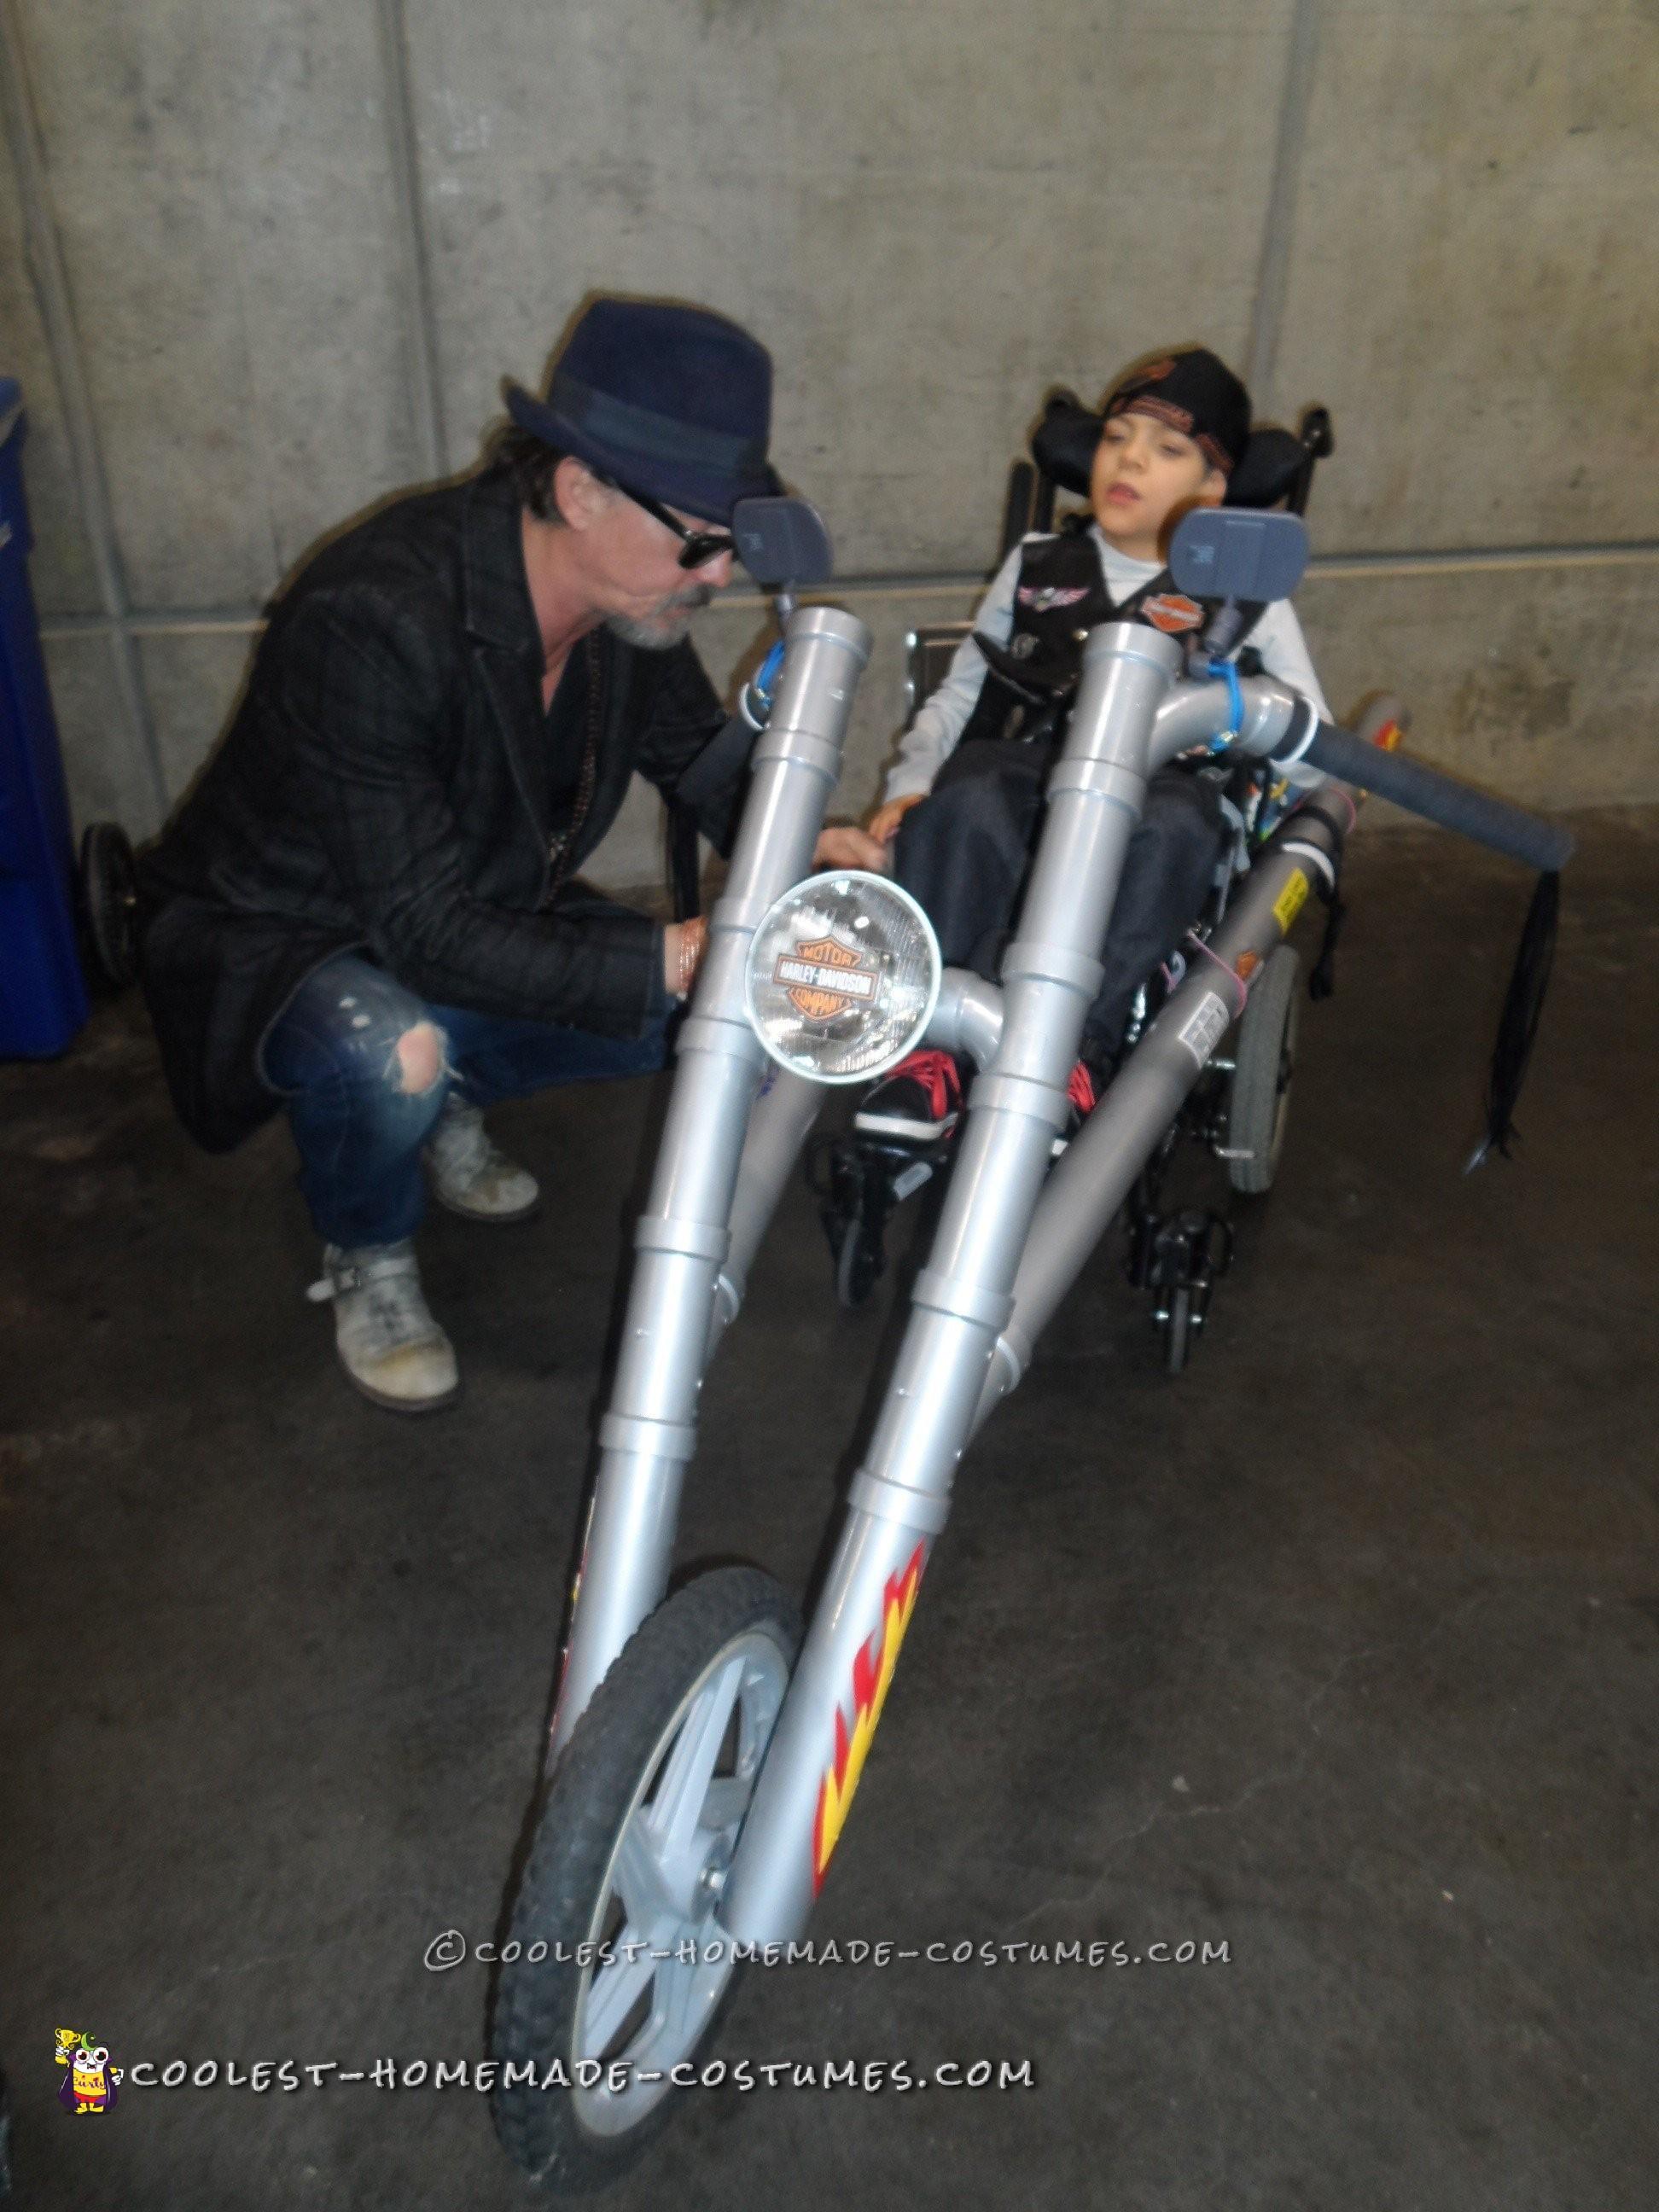 PVC Pipe Harley Davidson Wheelchair Costume